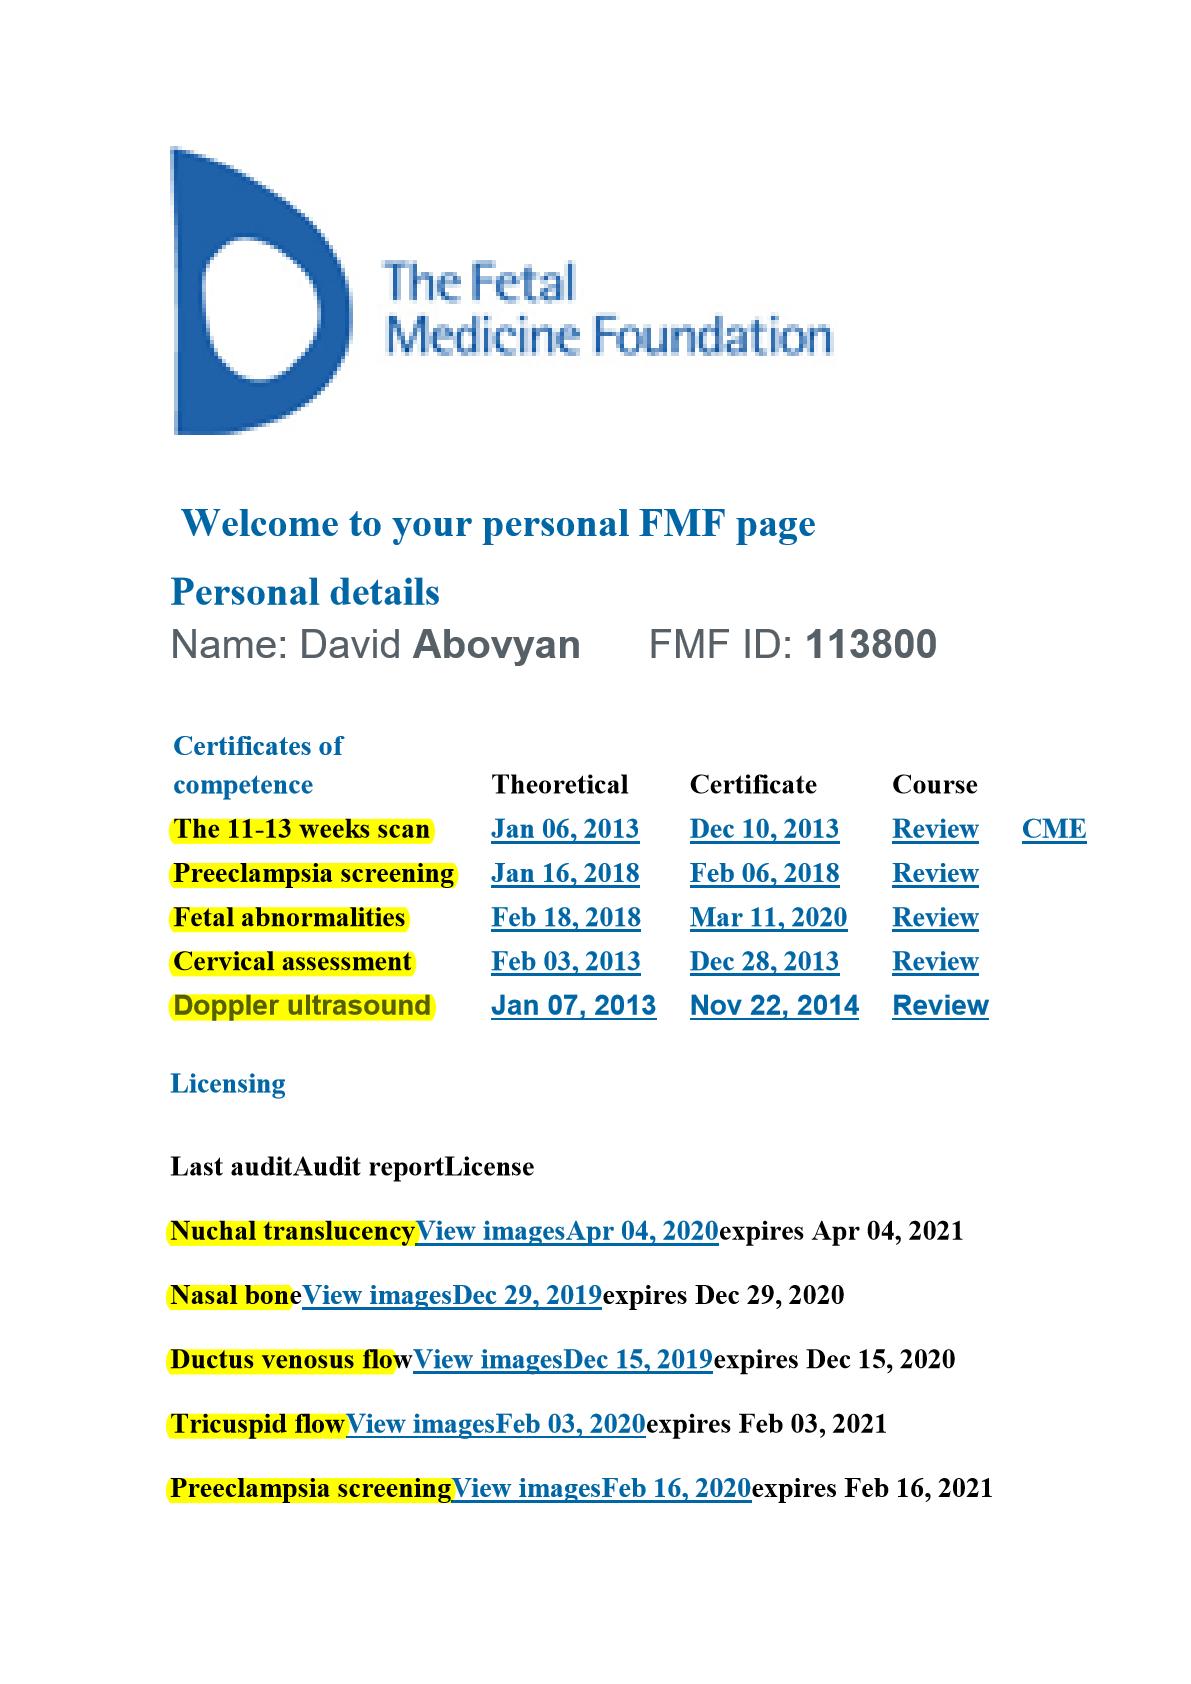 David Abovyan fatal testing